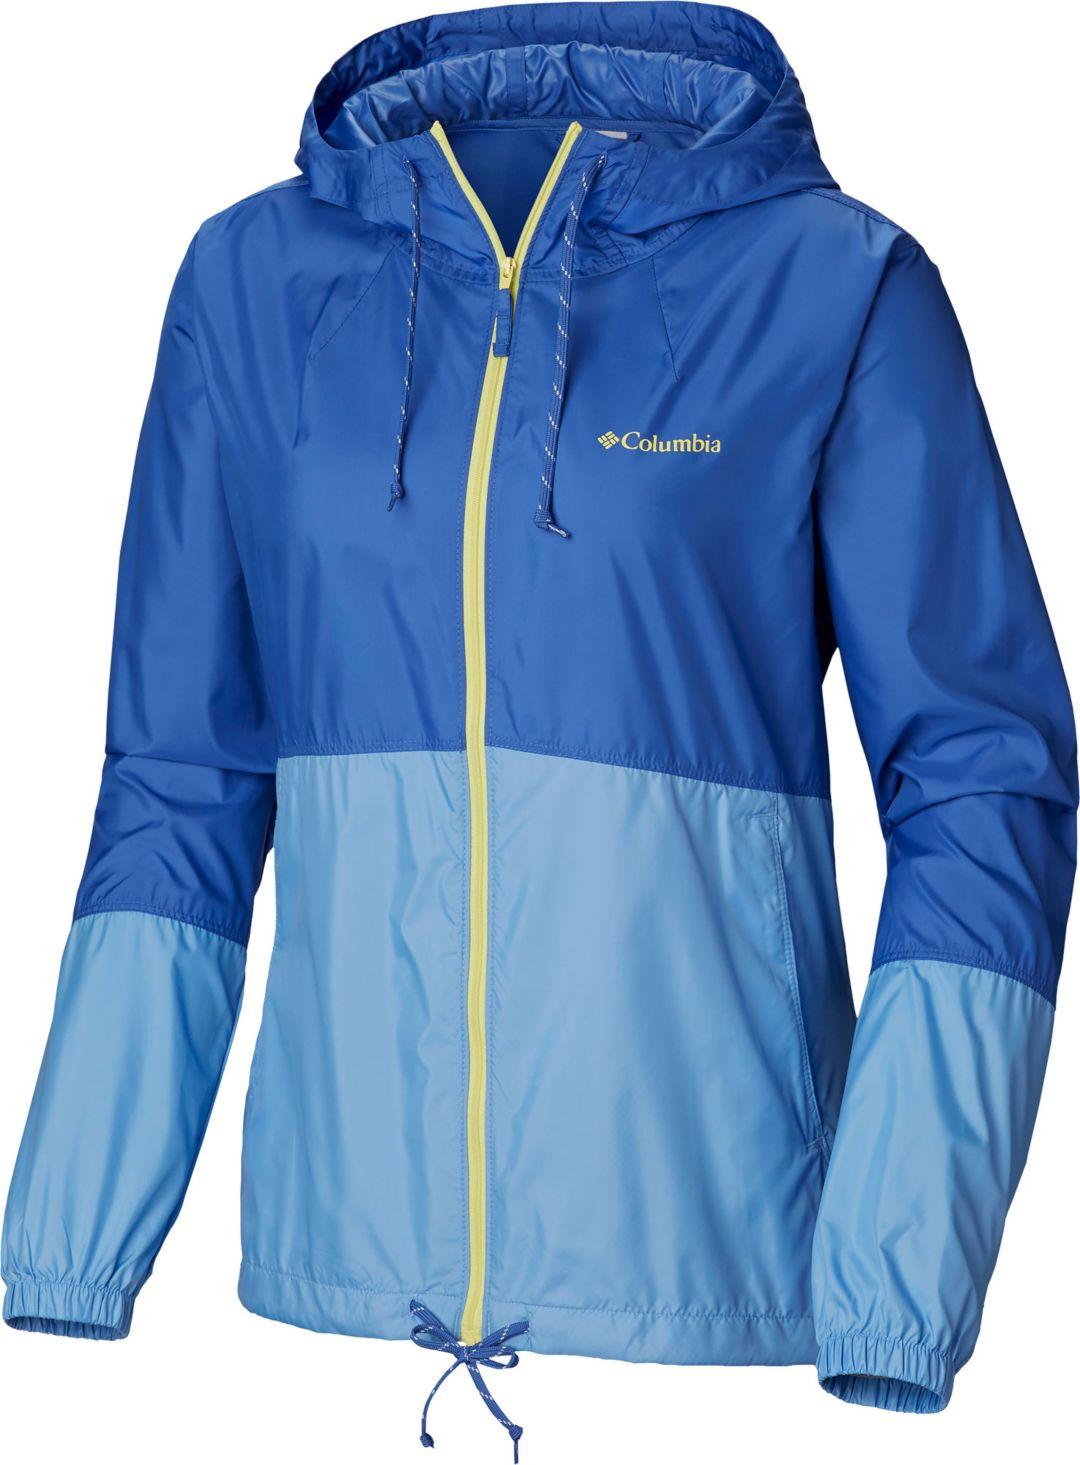 247660cfb22f03 Columbia Women s Flash Forward Windbreaker Jacket 1